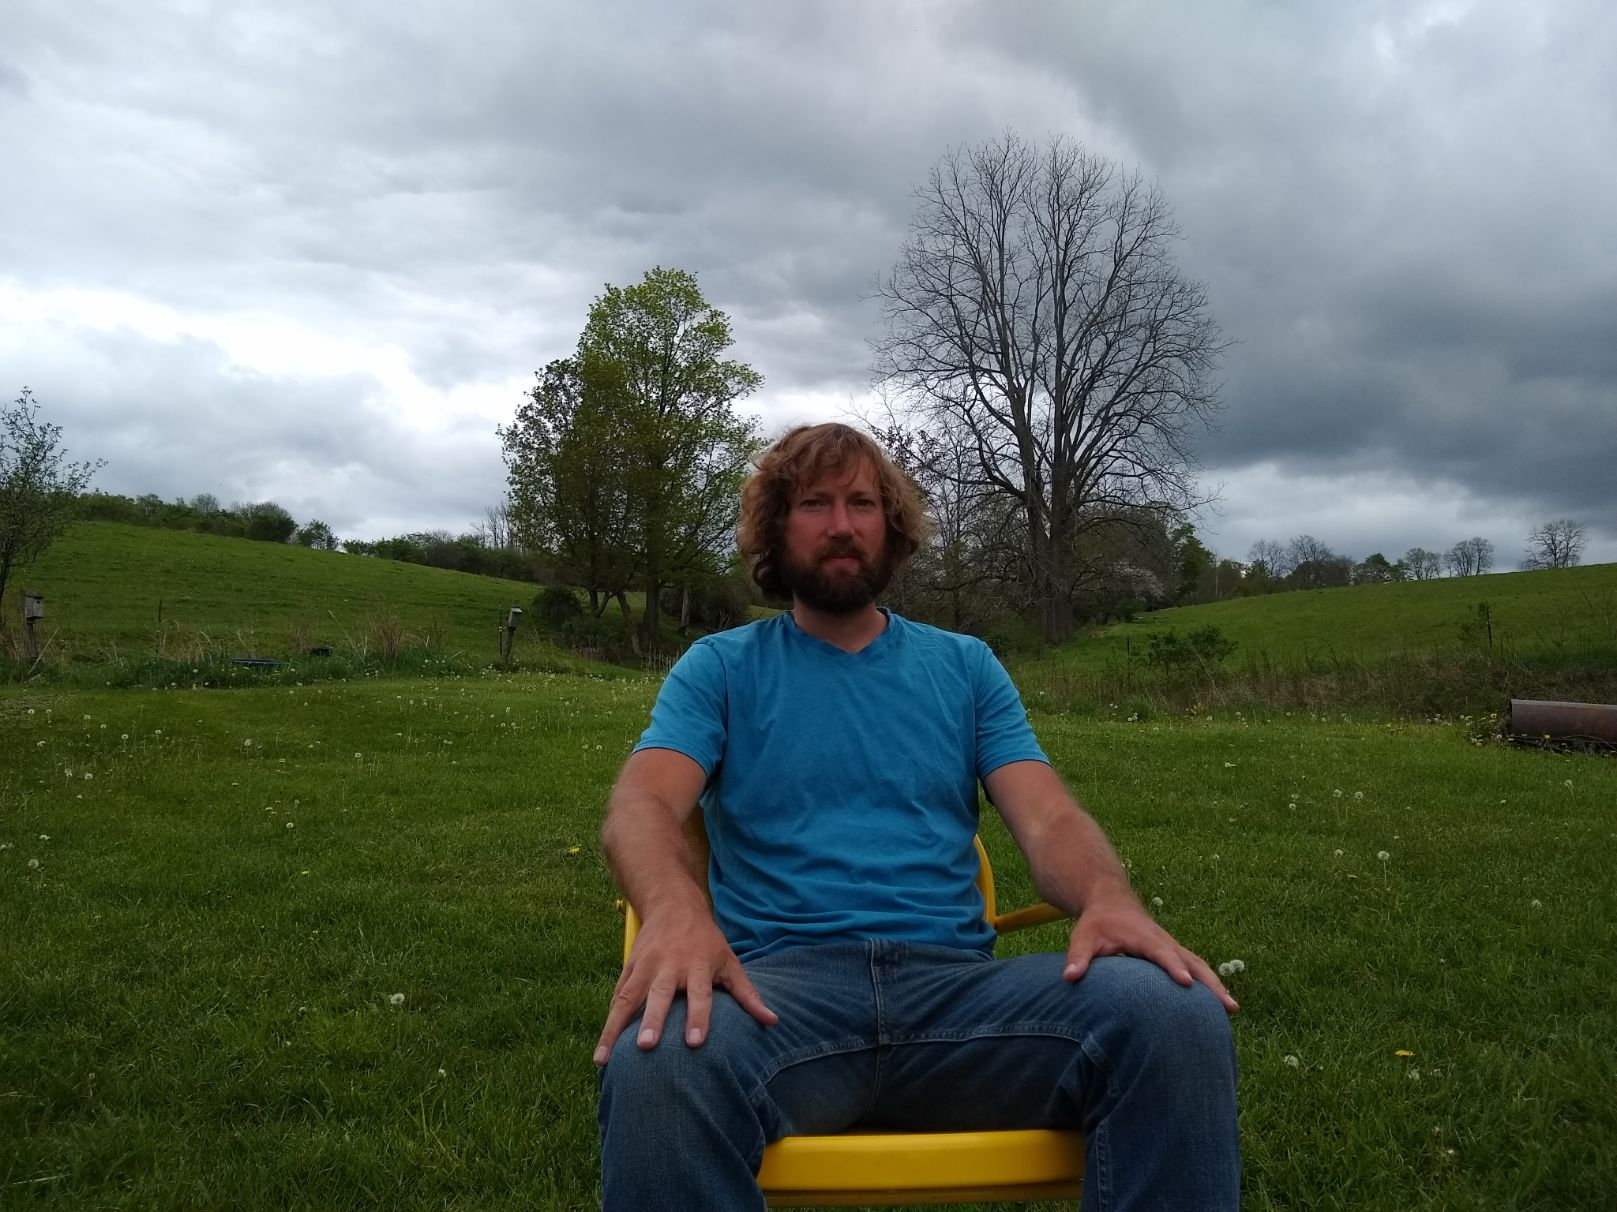 Ryan Dennis, dairy farming, farmer, writing, writer, student